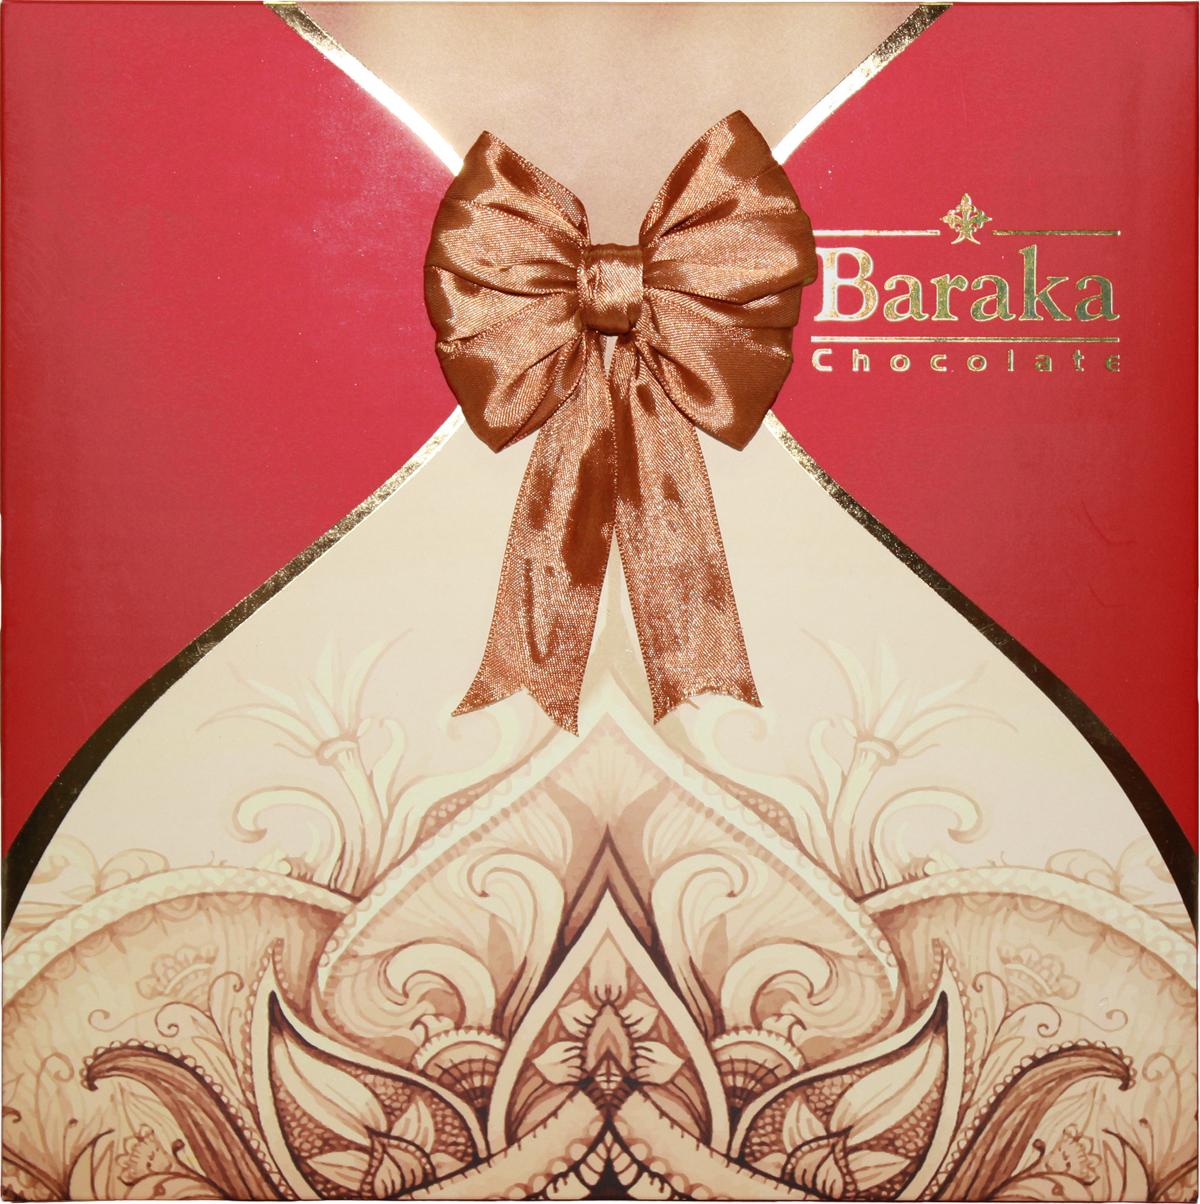 Baraka Бану ассорти шоколадных конфет, 240 г